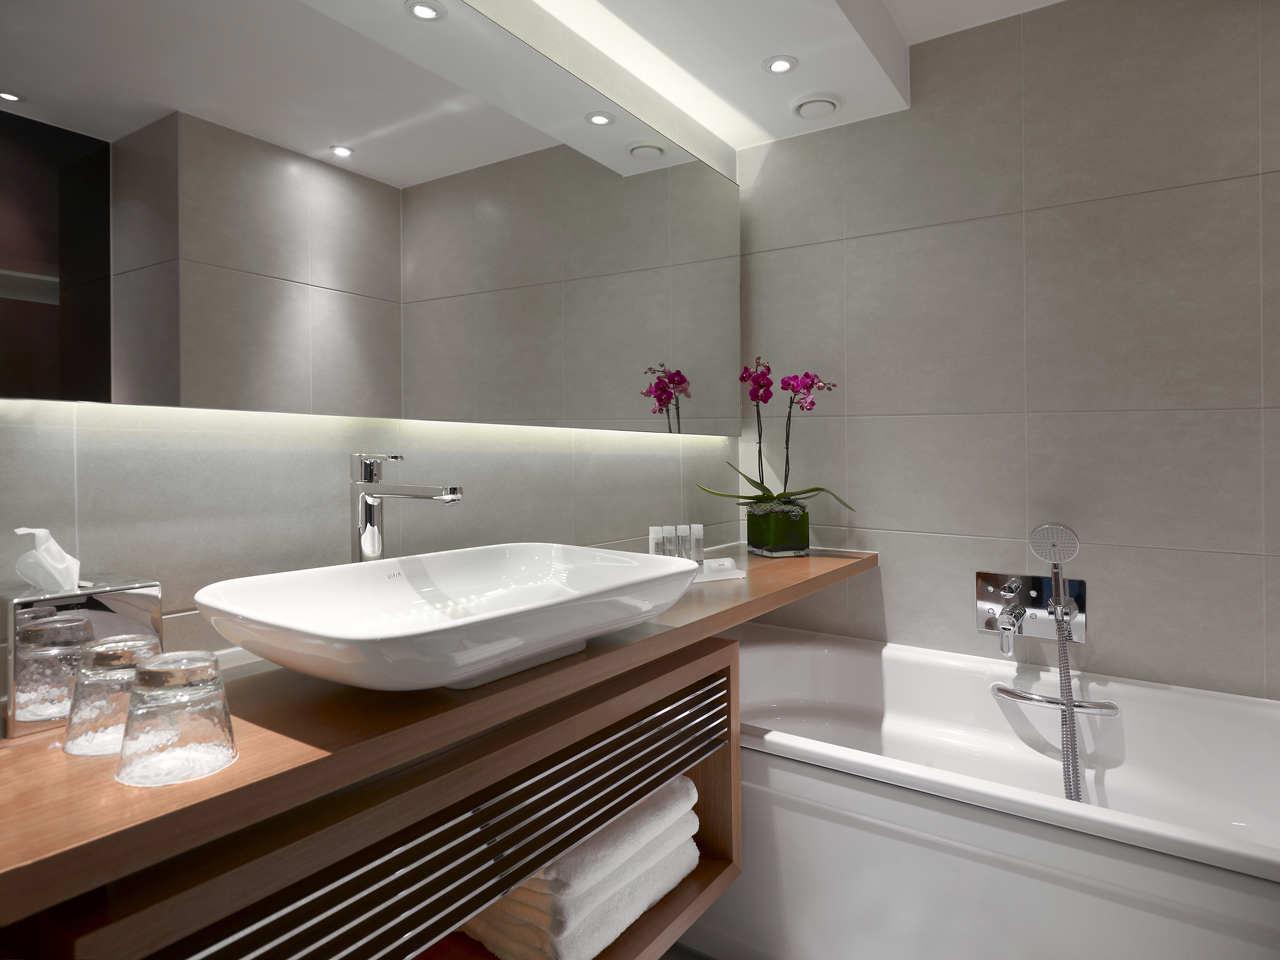 westminster bridge park plaza hotel by buj architects uri. Black Bedroom Furniture Sets. Home Design Ideas